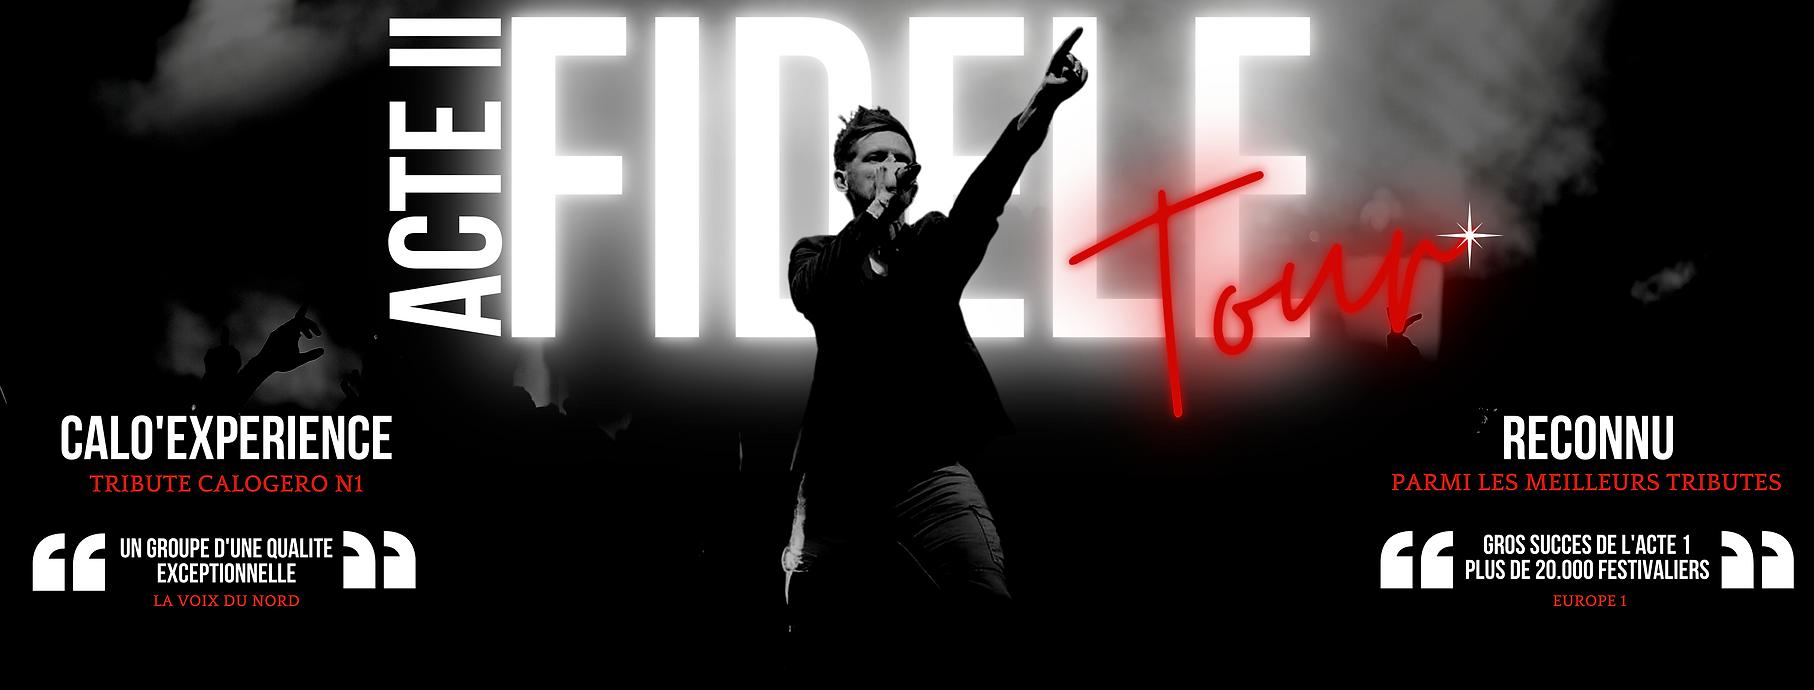 fidele (5).png